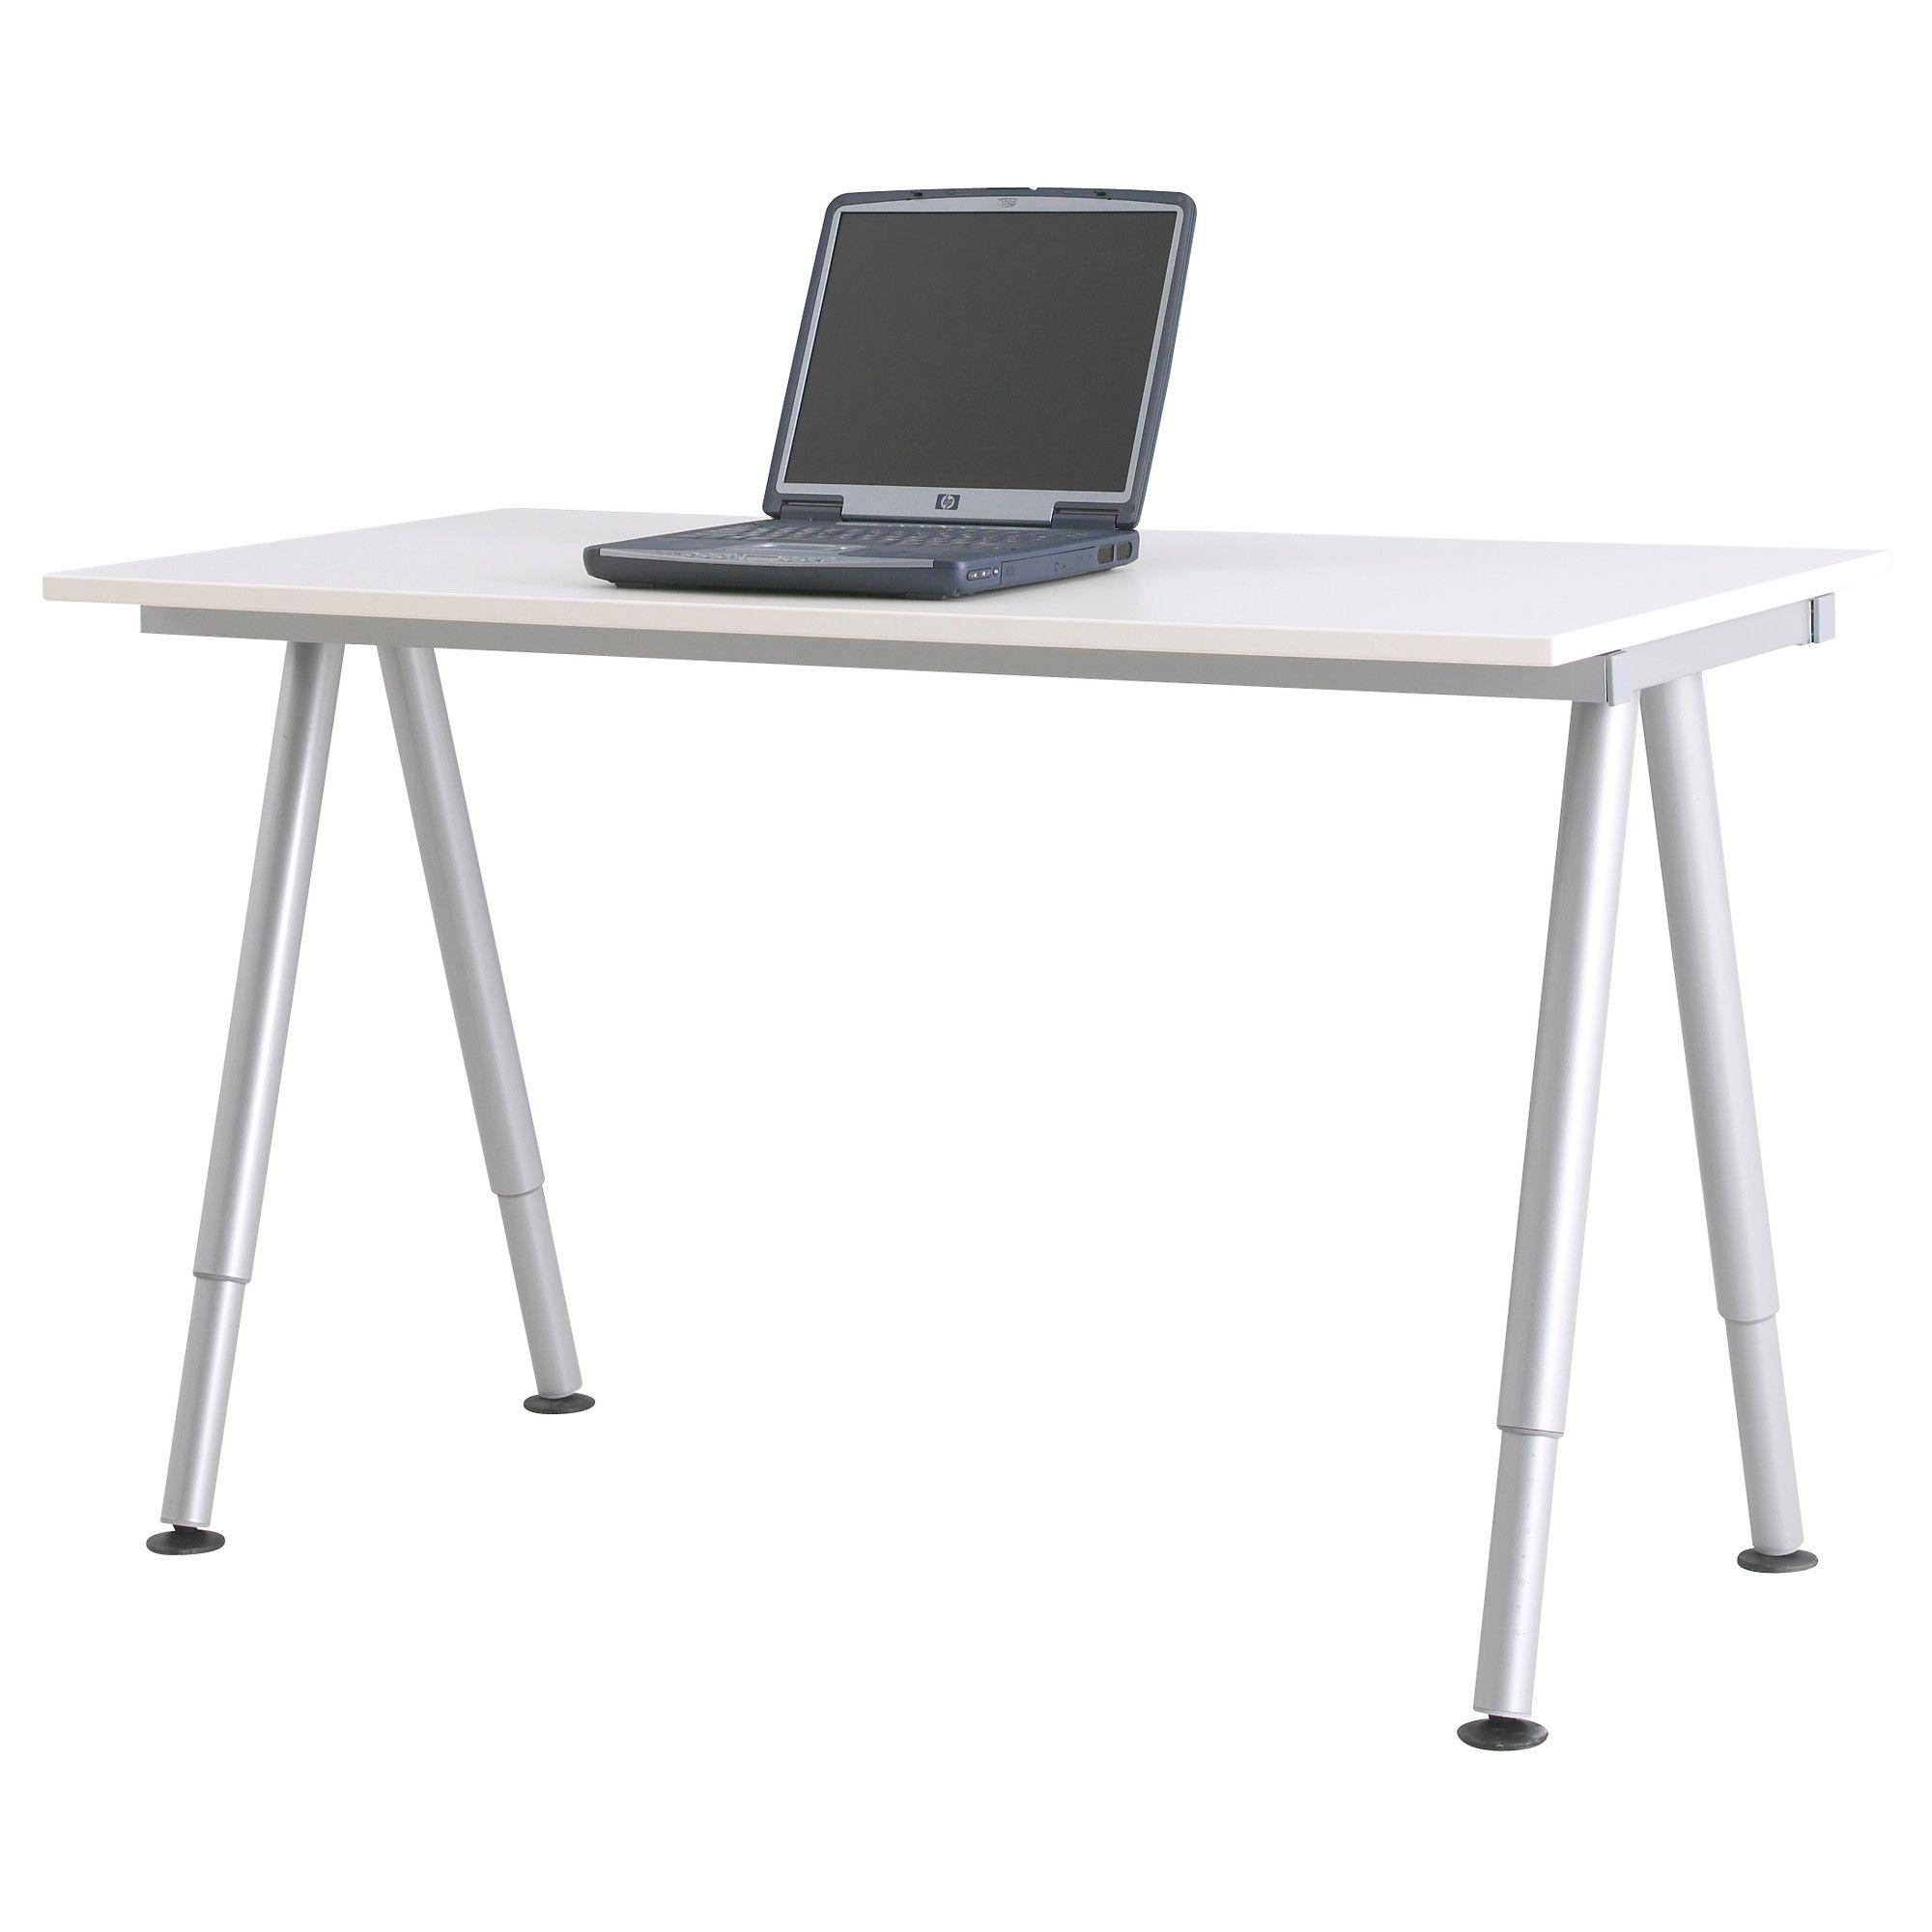 Ikea Schreibtisch Galant x2 galant desk white a leg silver color ikea bedroom